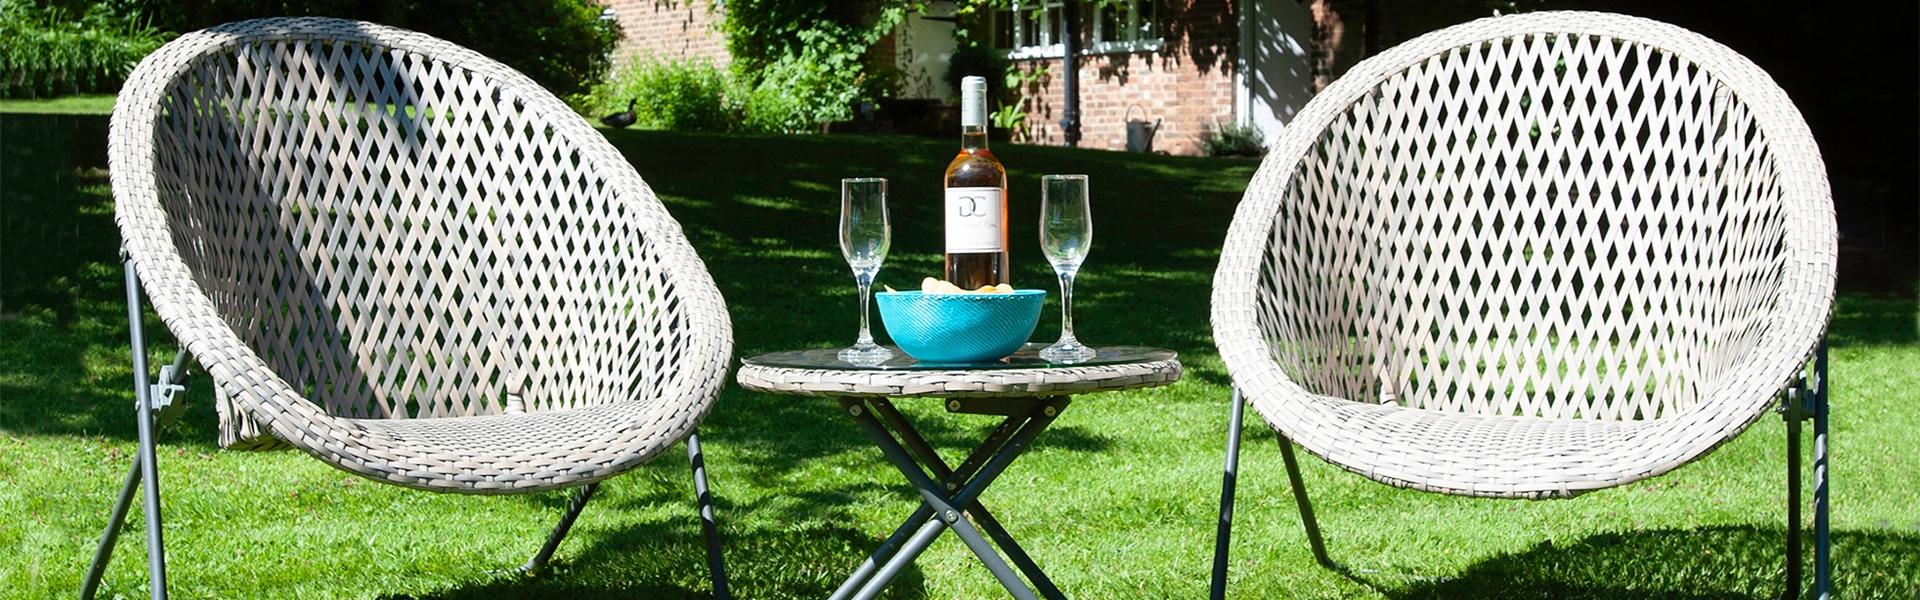 Faux Rattan Garden Furniture Set